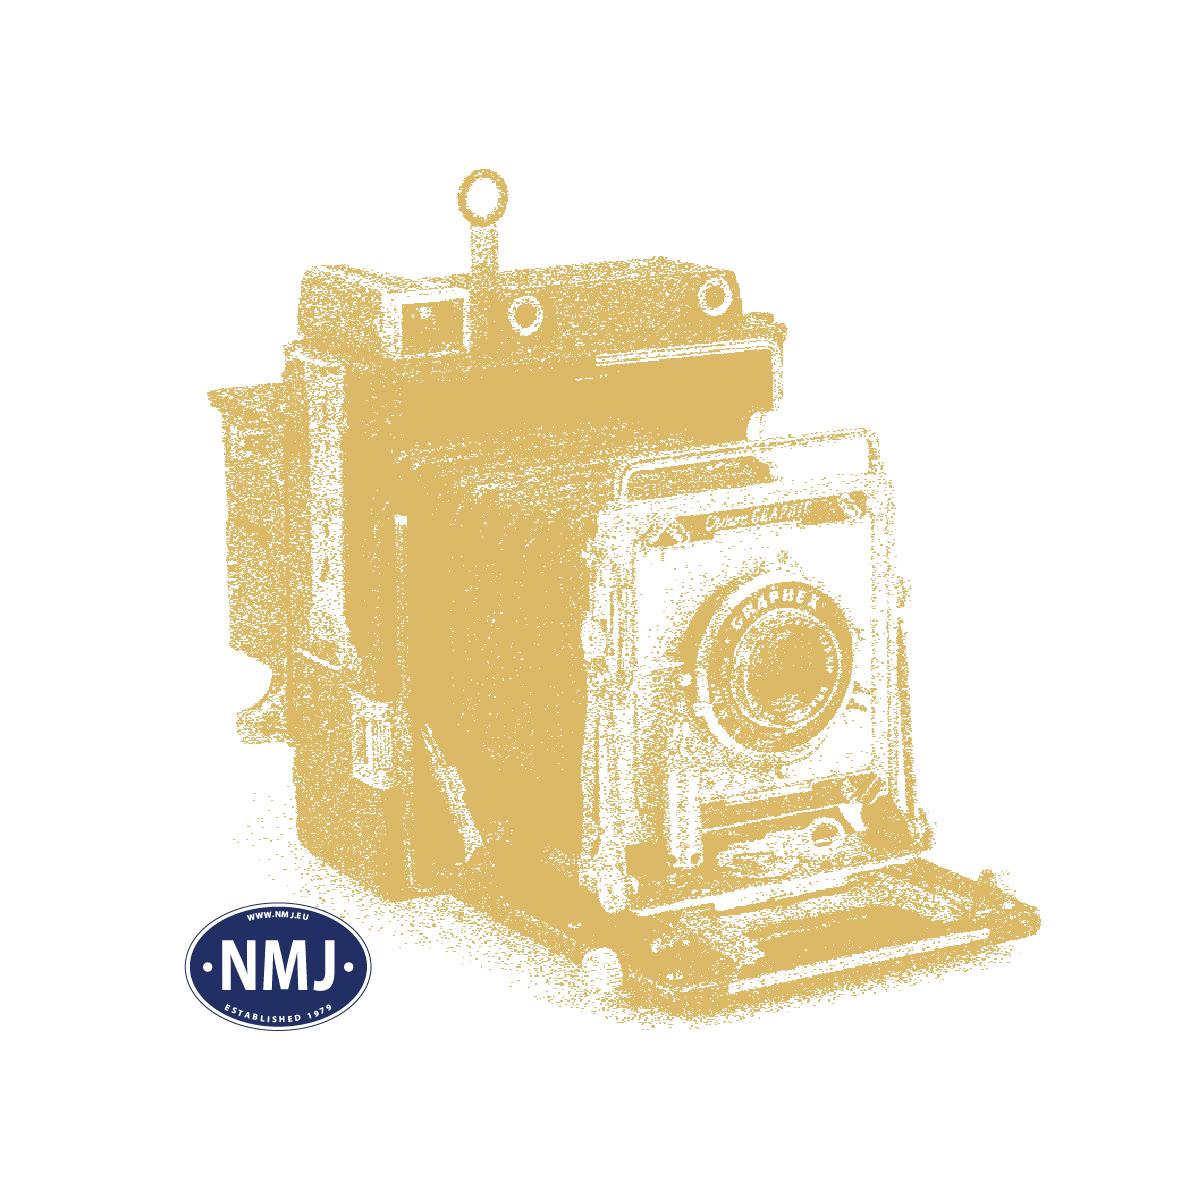 NMJT84.101 - NMJ Topline NSB BM69A.01, DCC m/ Lyd